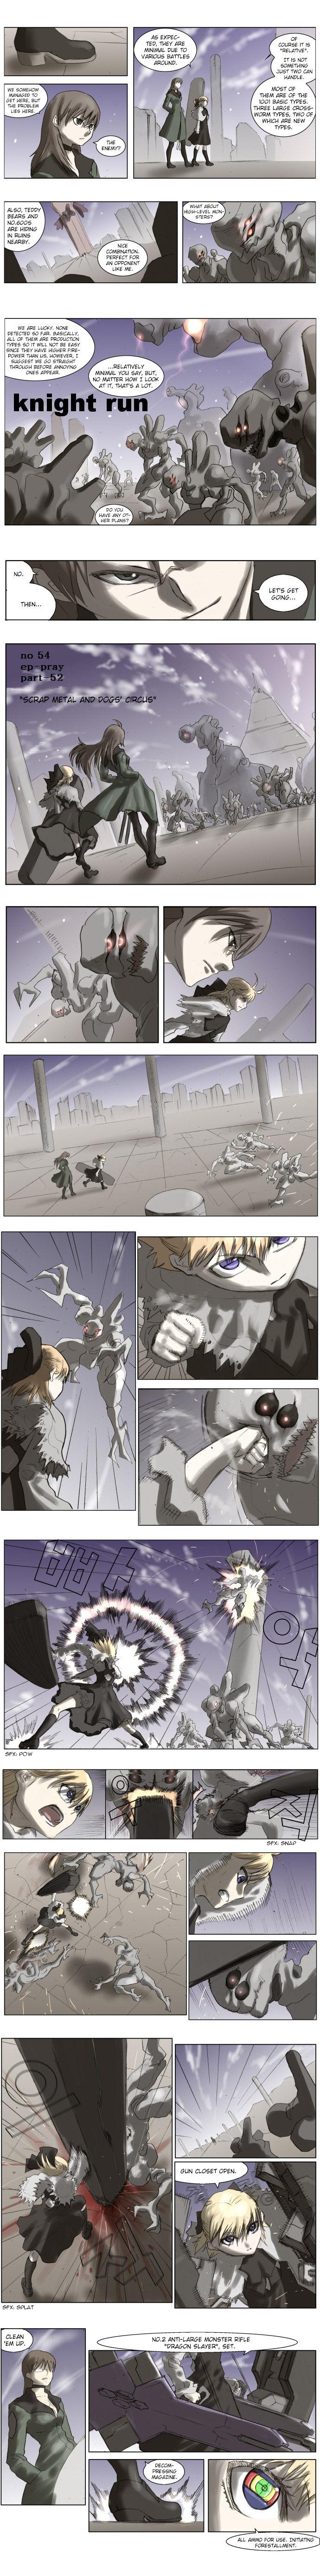 Knight Run 54 Page 2